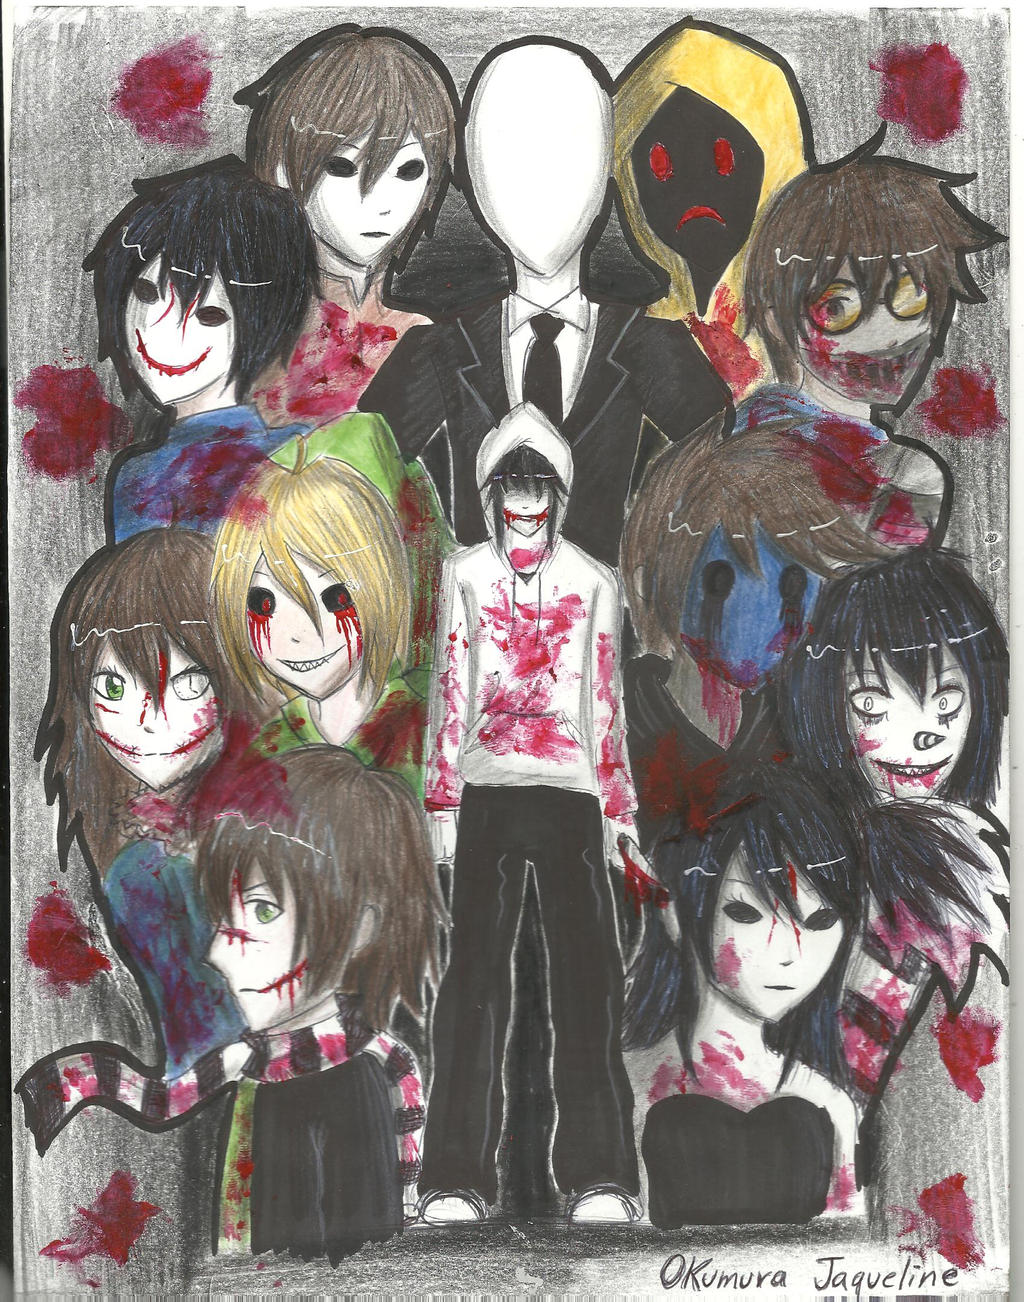 Creepypastas Family by OkumuraJaqueline on DeviantArt